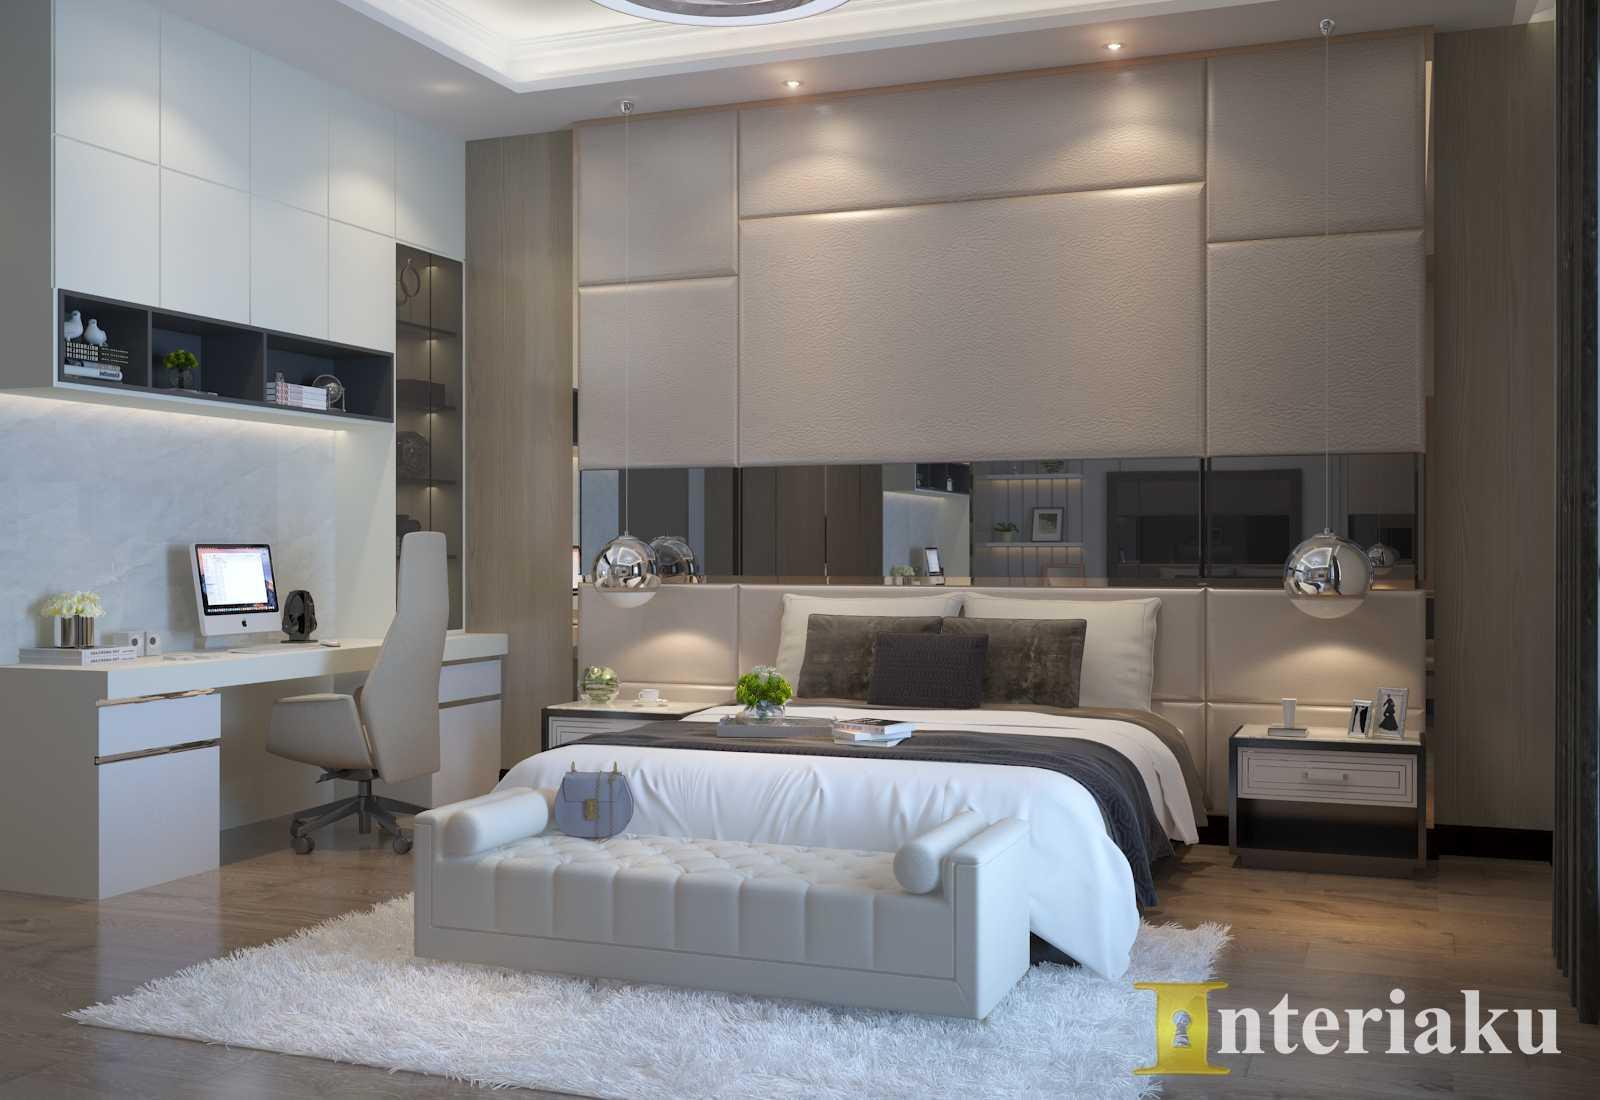 Interiaku Modern Bedroom Pontianak, Kota Pontianak, Kalimantan Barat, Indonesia Pontianak, Kota Pontianak, Kalimantan Barat, Indonesia Interiaku-Modern-Bedroom  67915